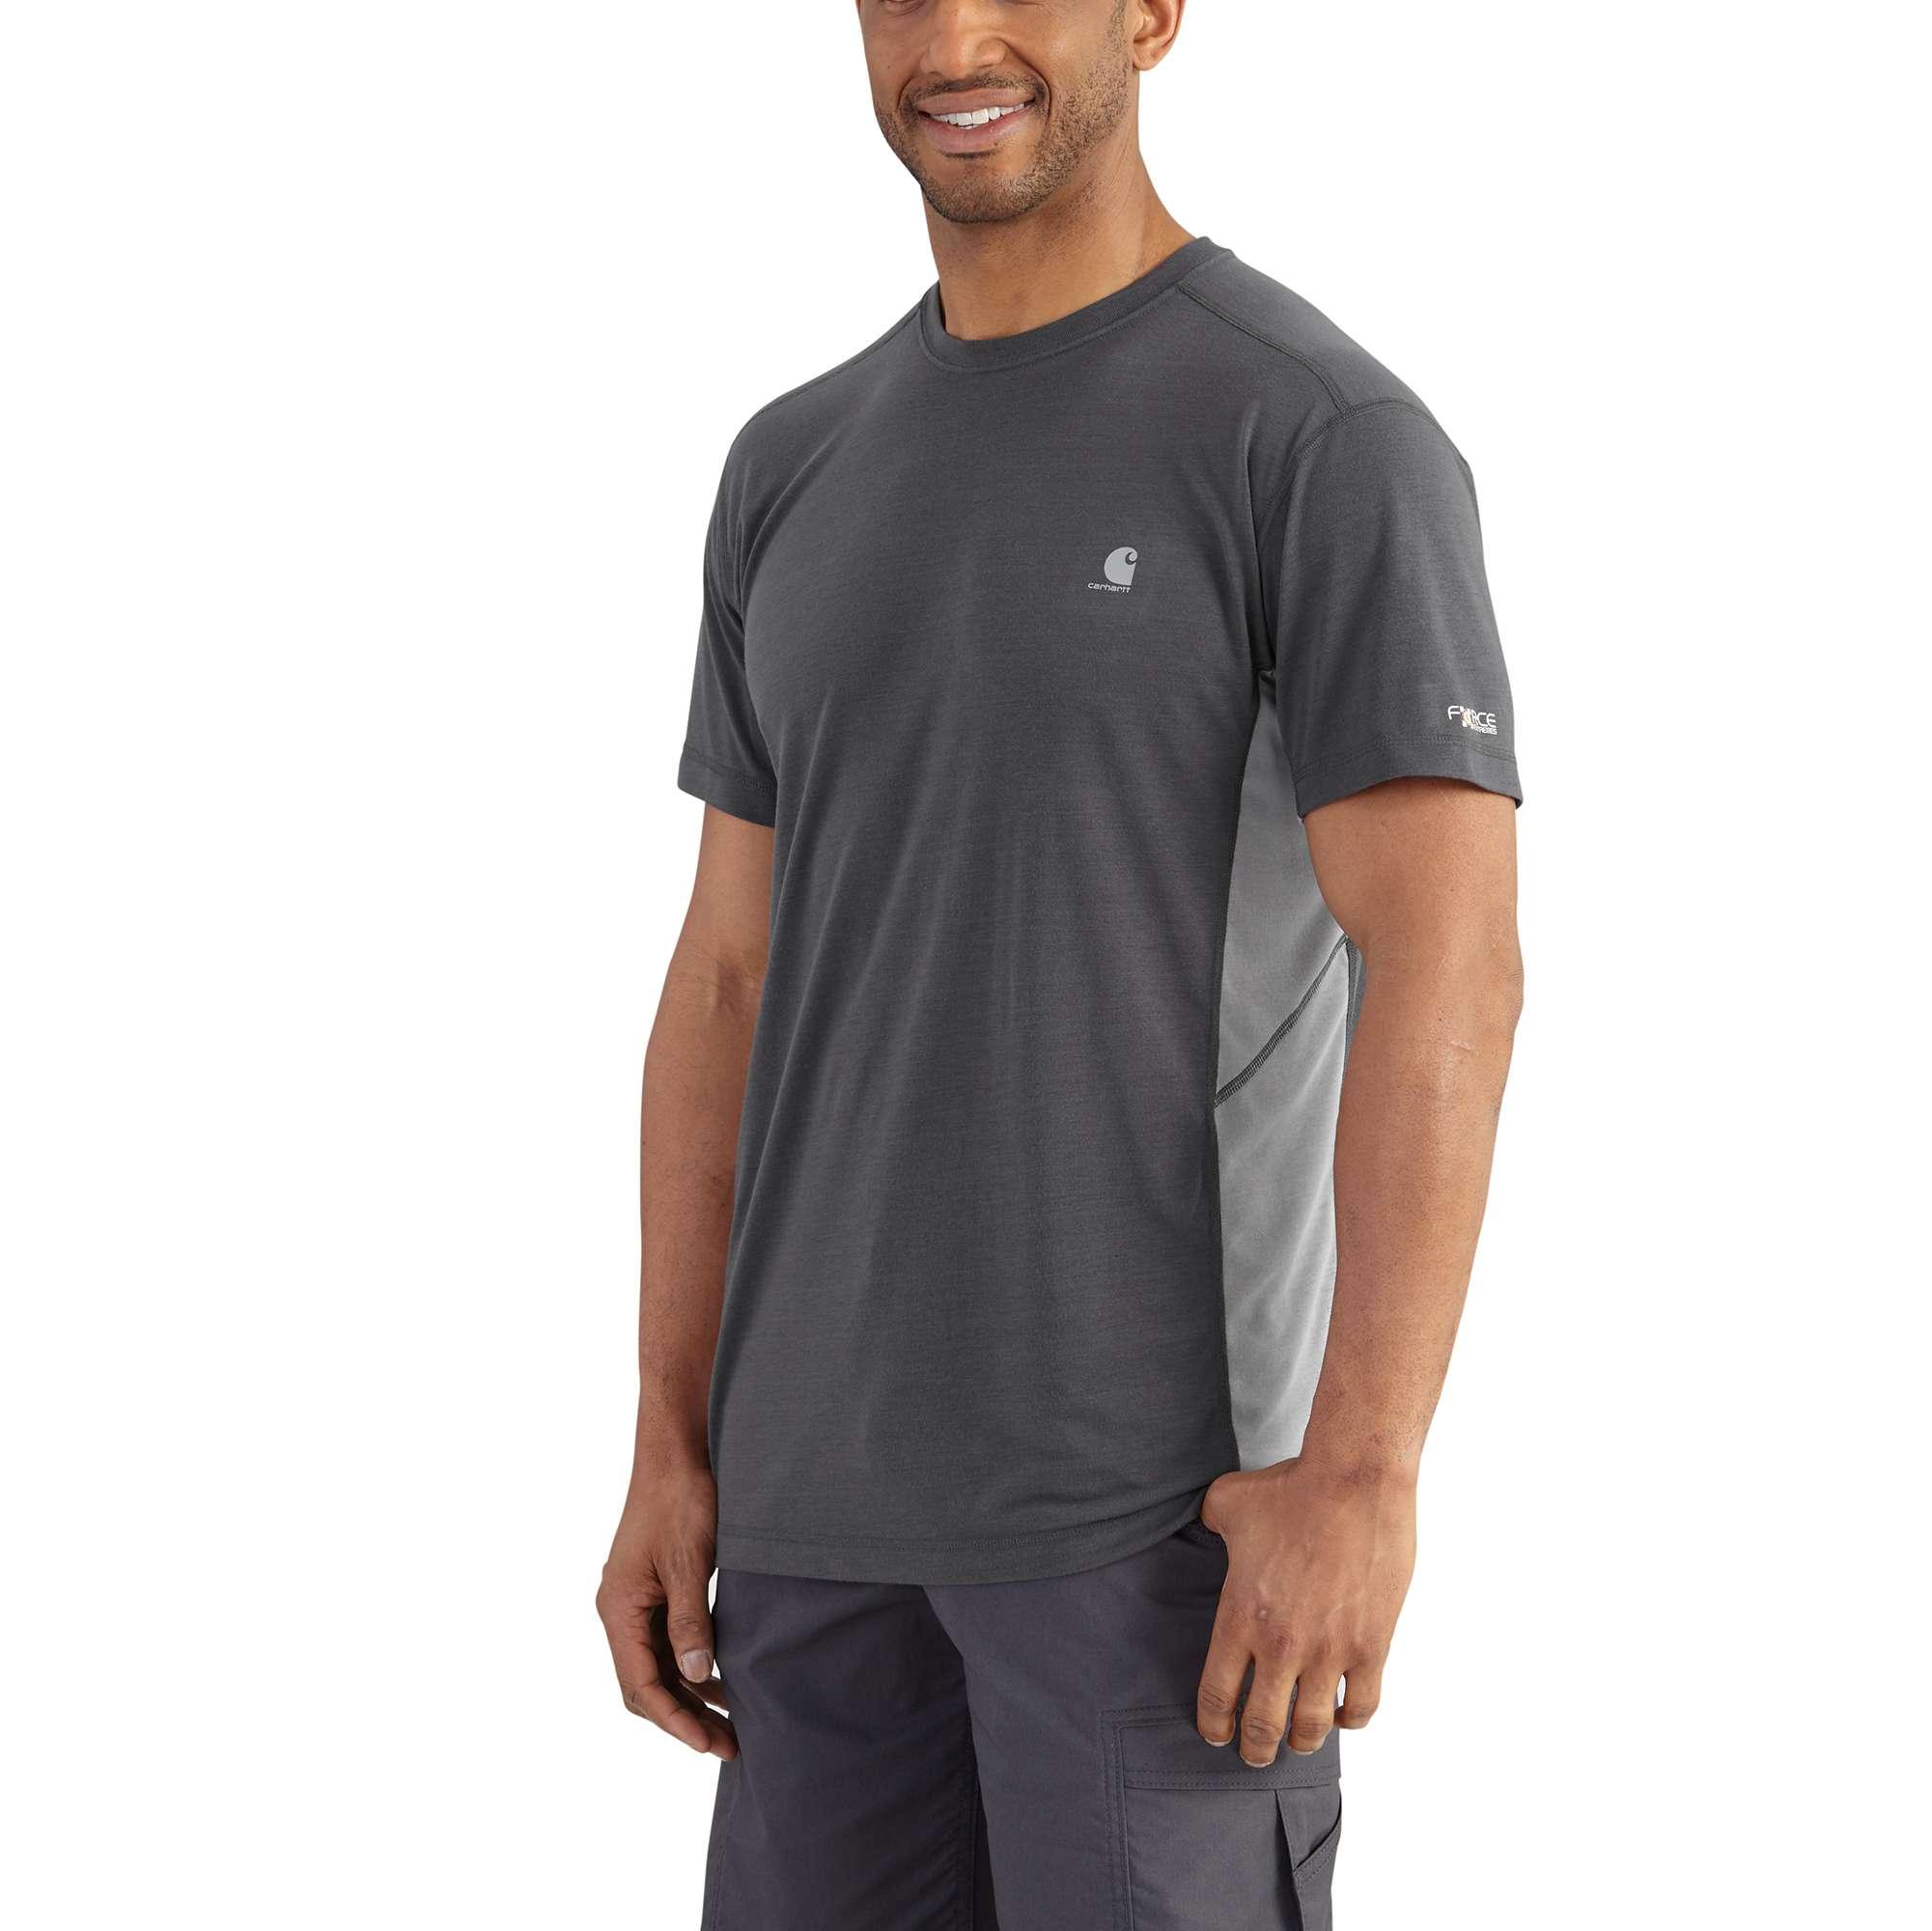 carhartt force extremes short sleeve t-shirt shadow/asphalt xl